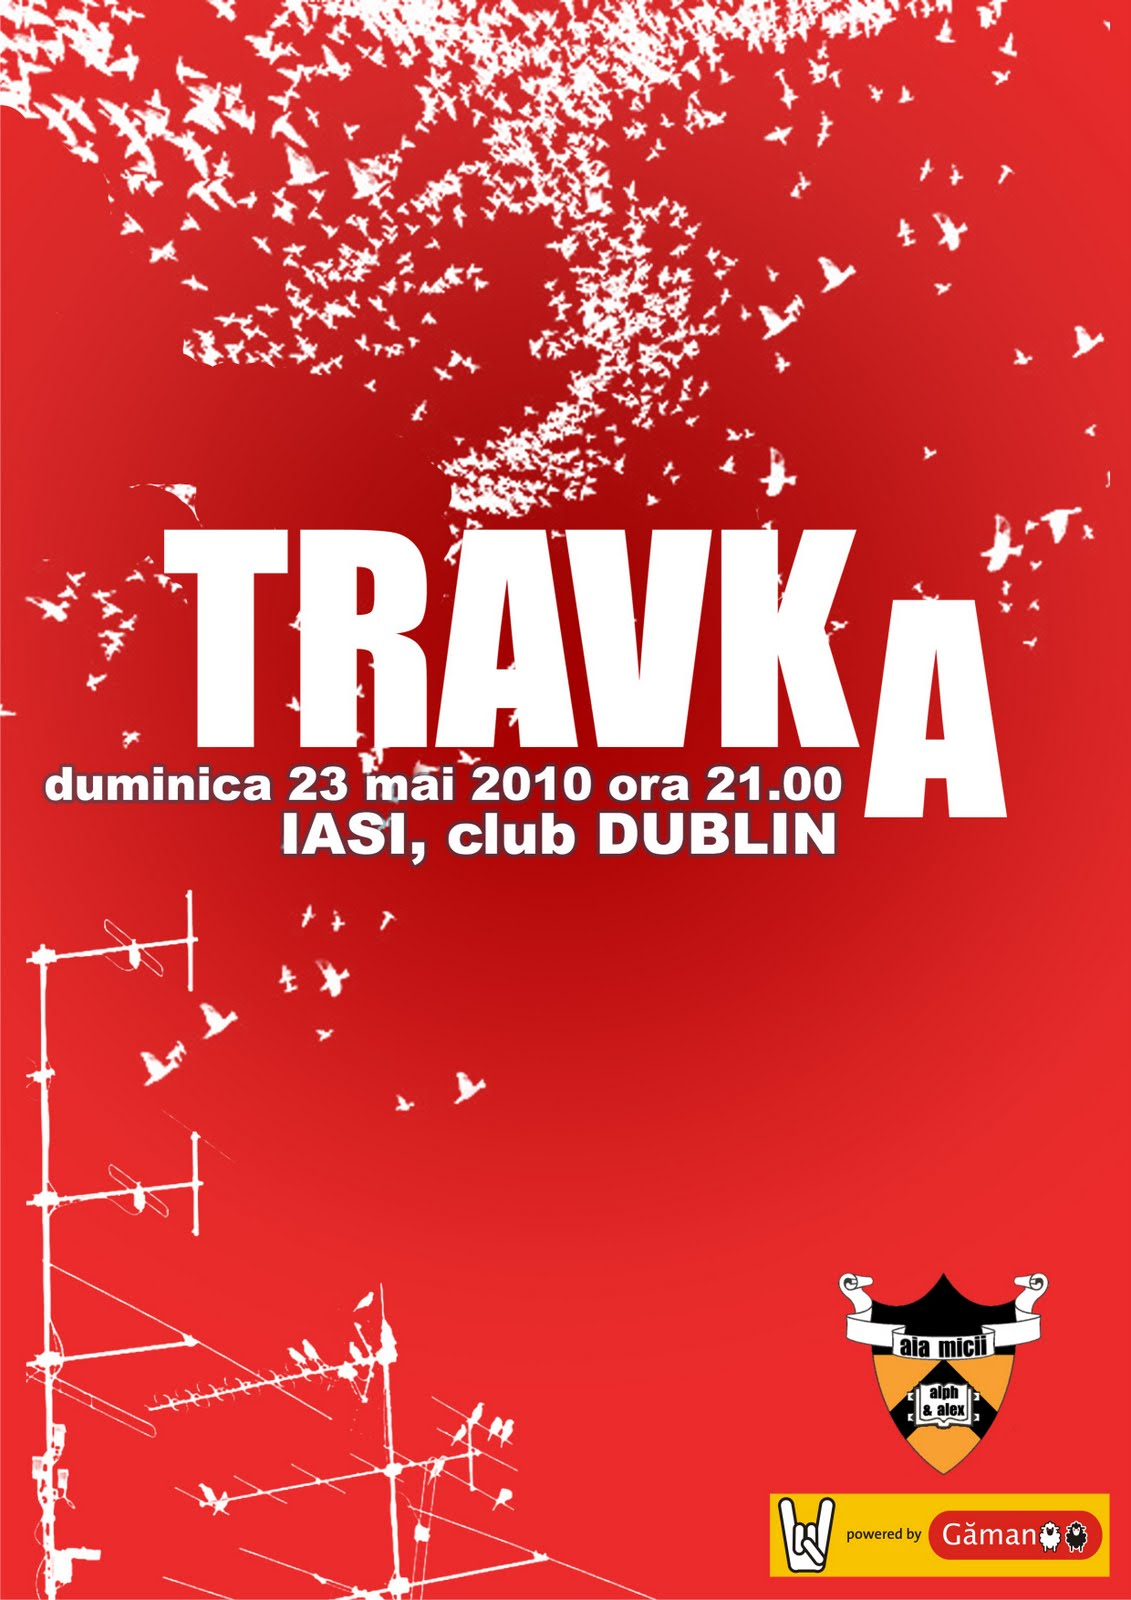 Concert TRAVKA in Iasi AFIS+TRAVKA